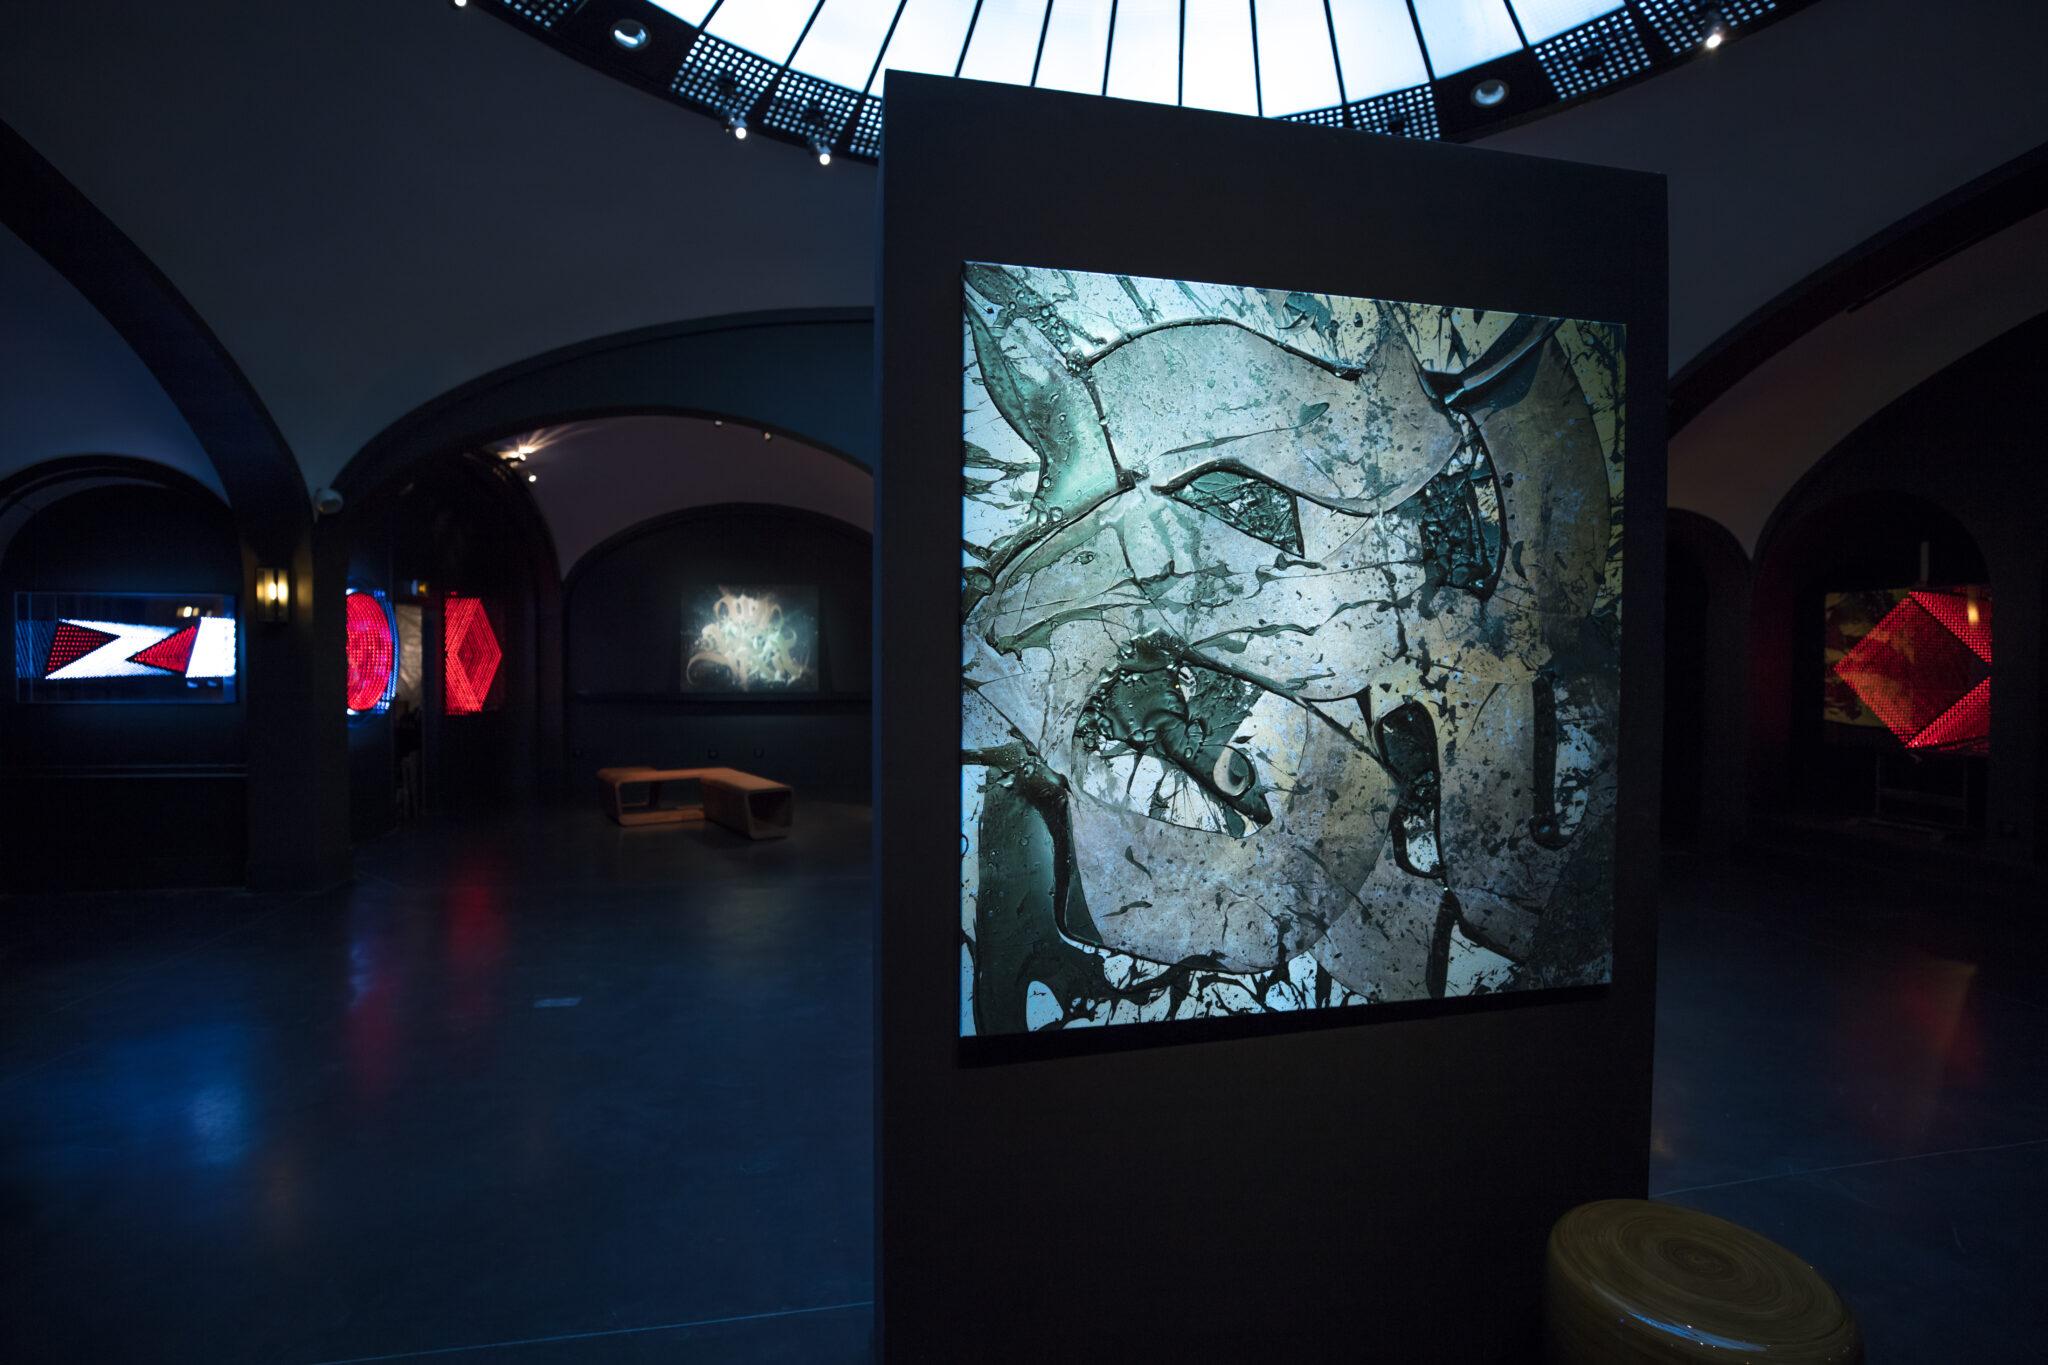 audrey-hatchikian-gallery-expo-momentum-art-contemporain-2018